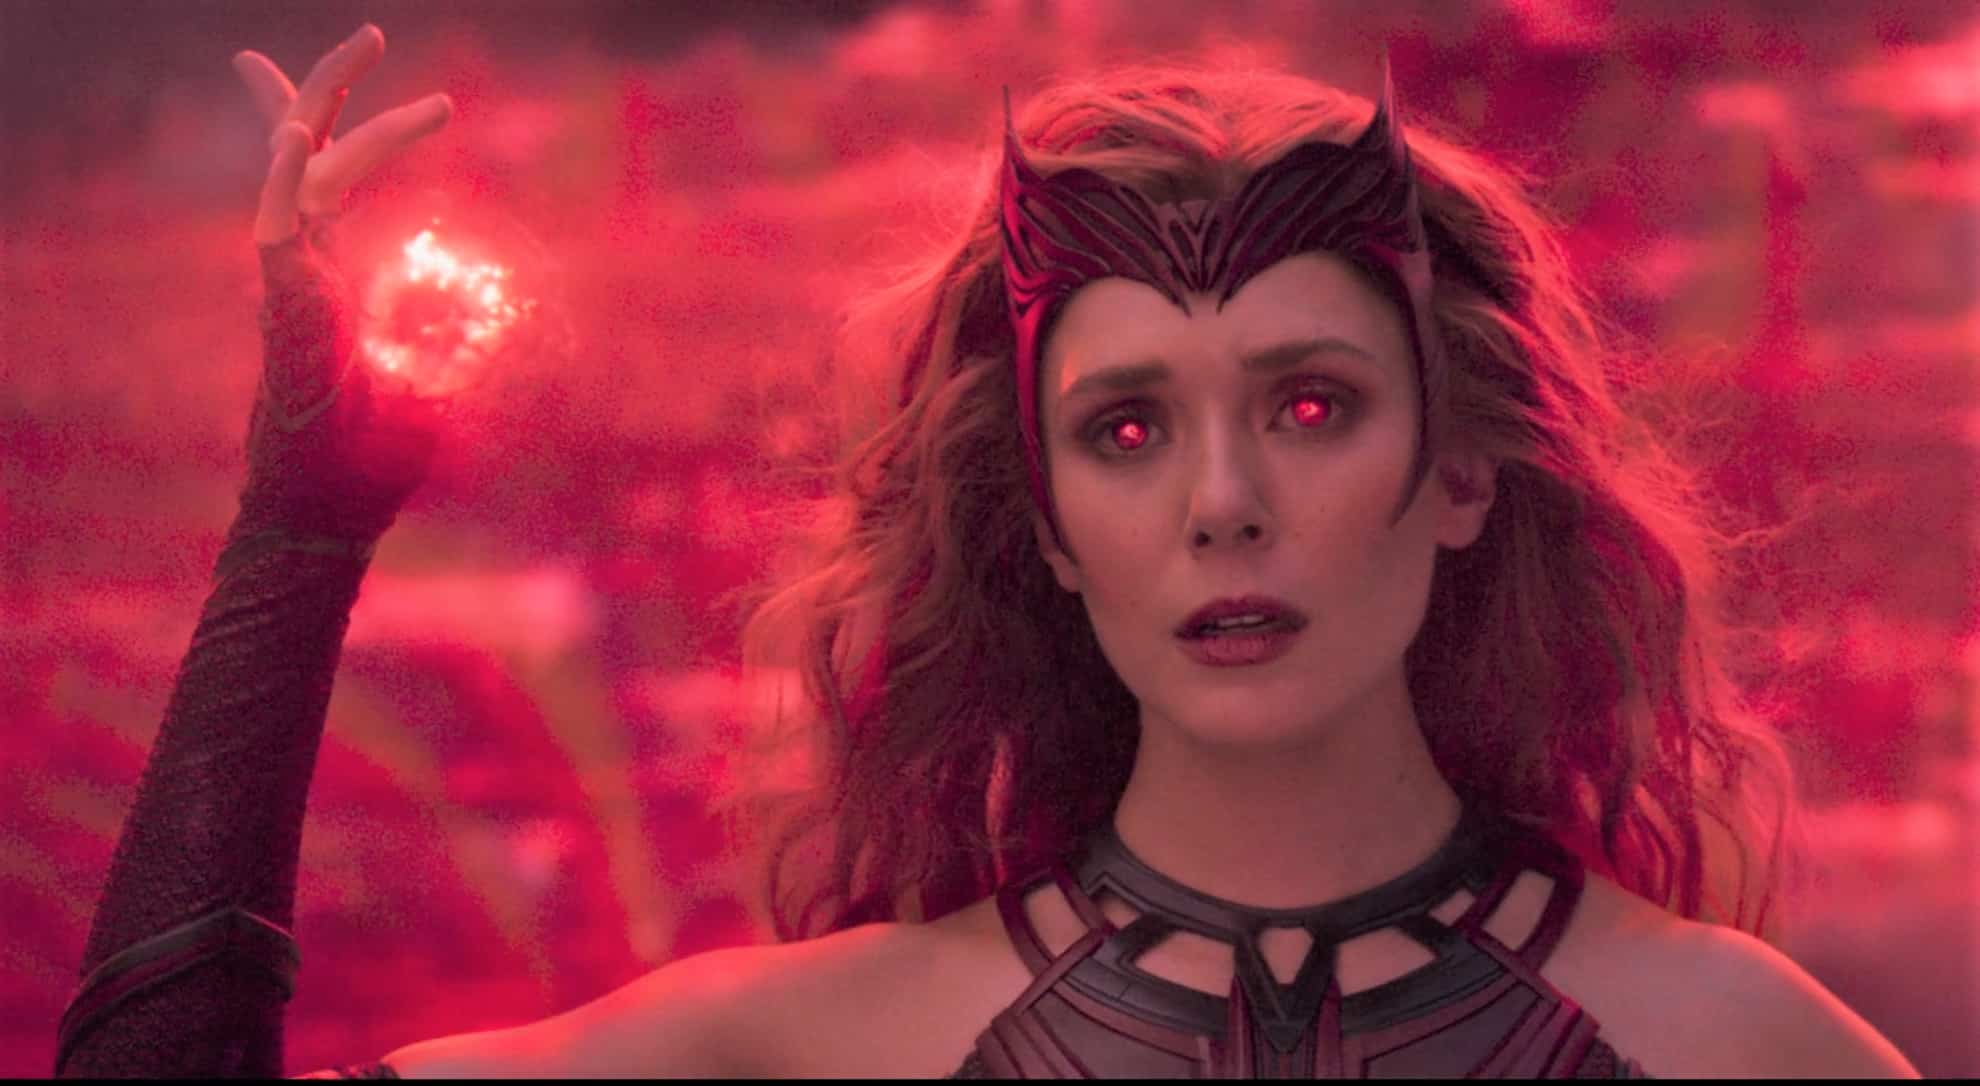 wandaVision Elizabeth Olsen Scarlet